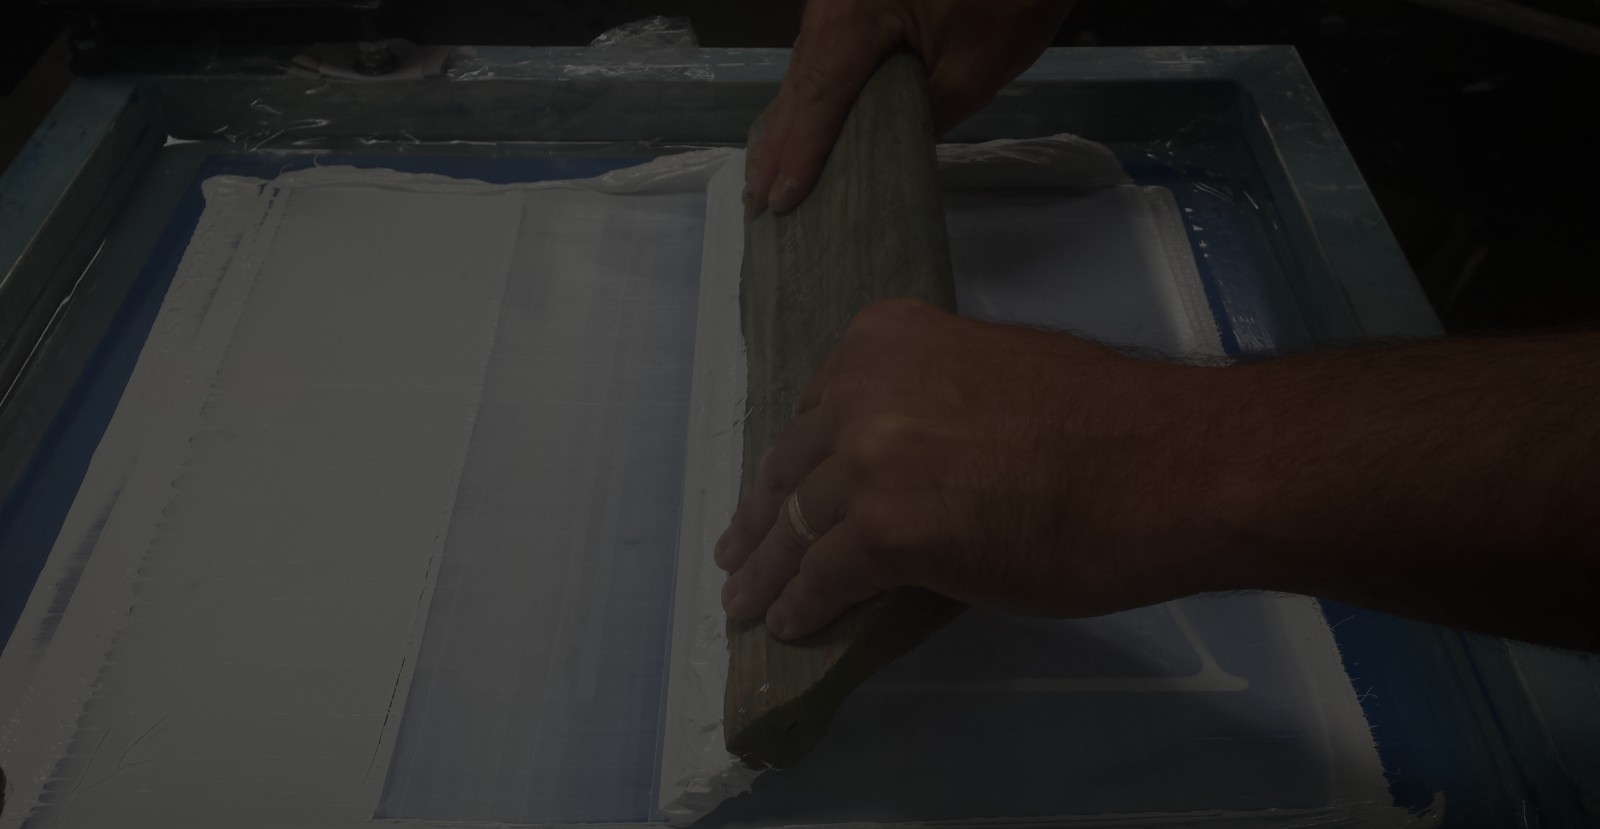 screen print procedure